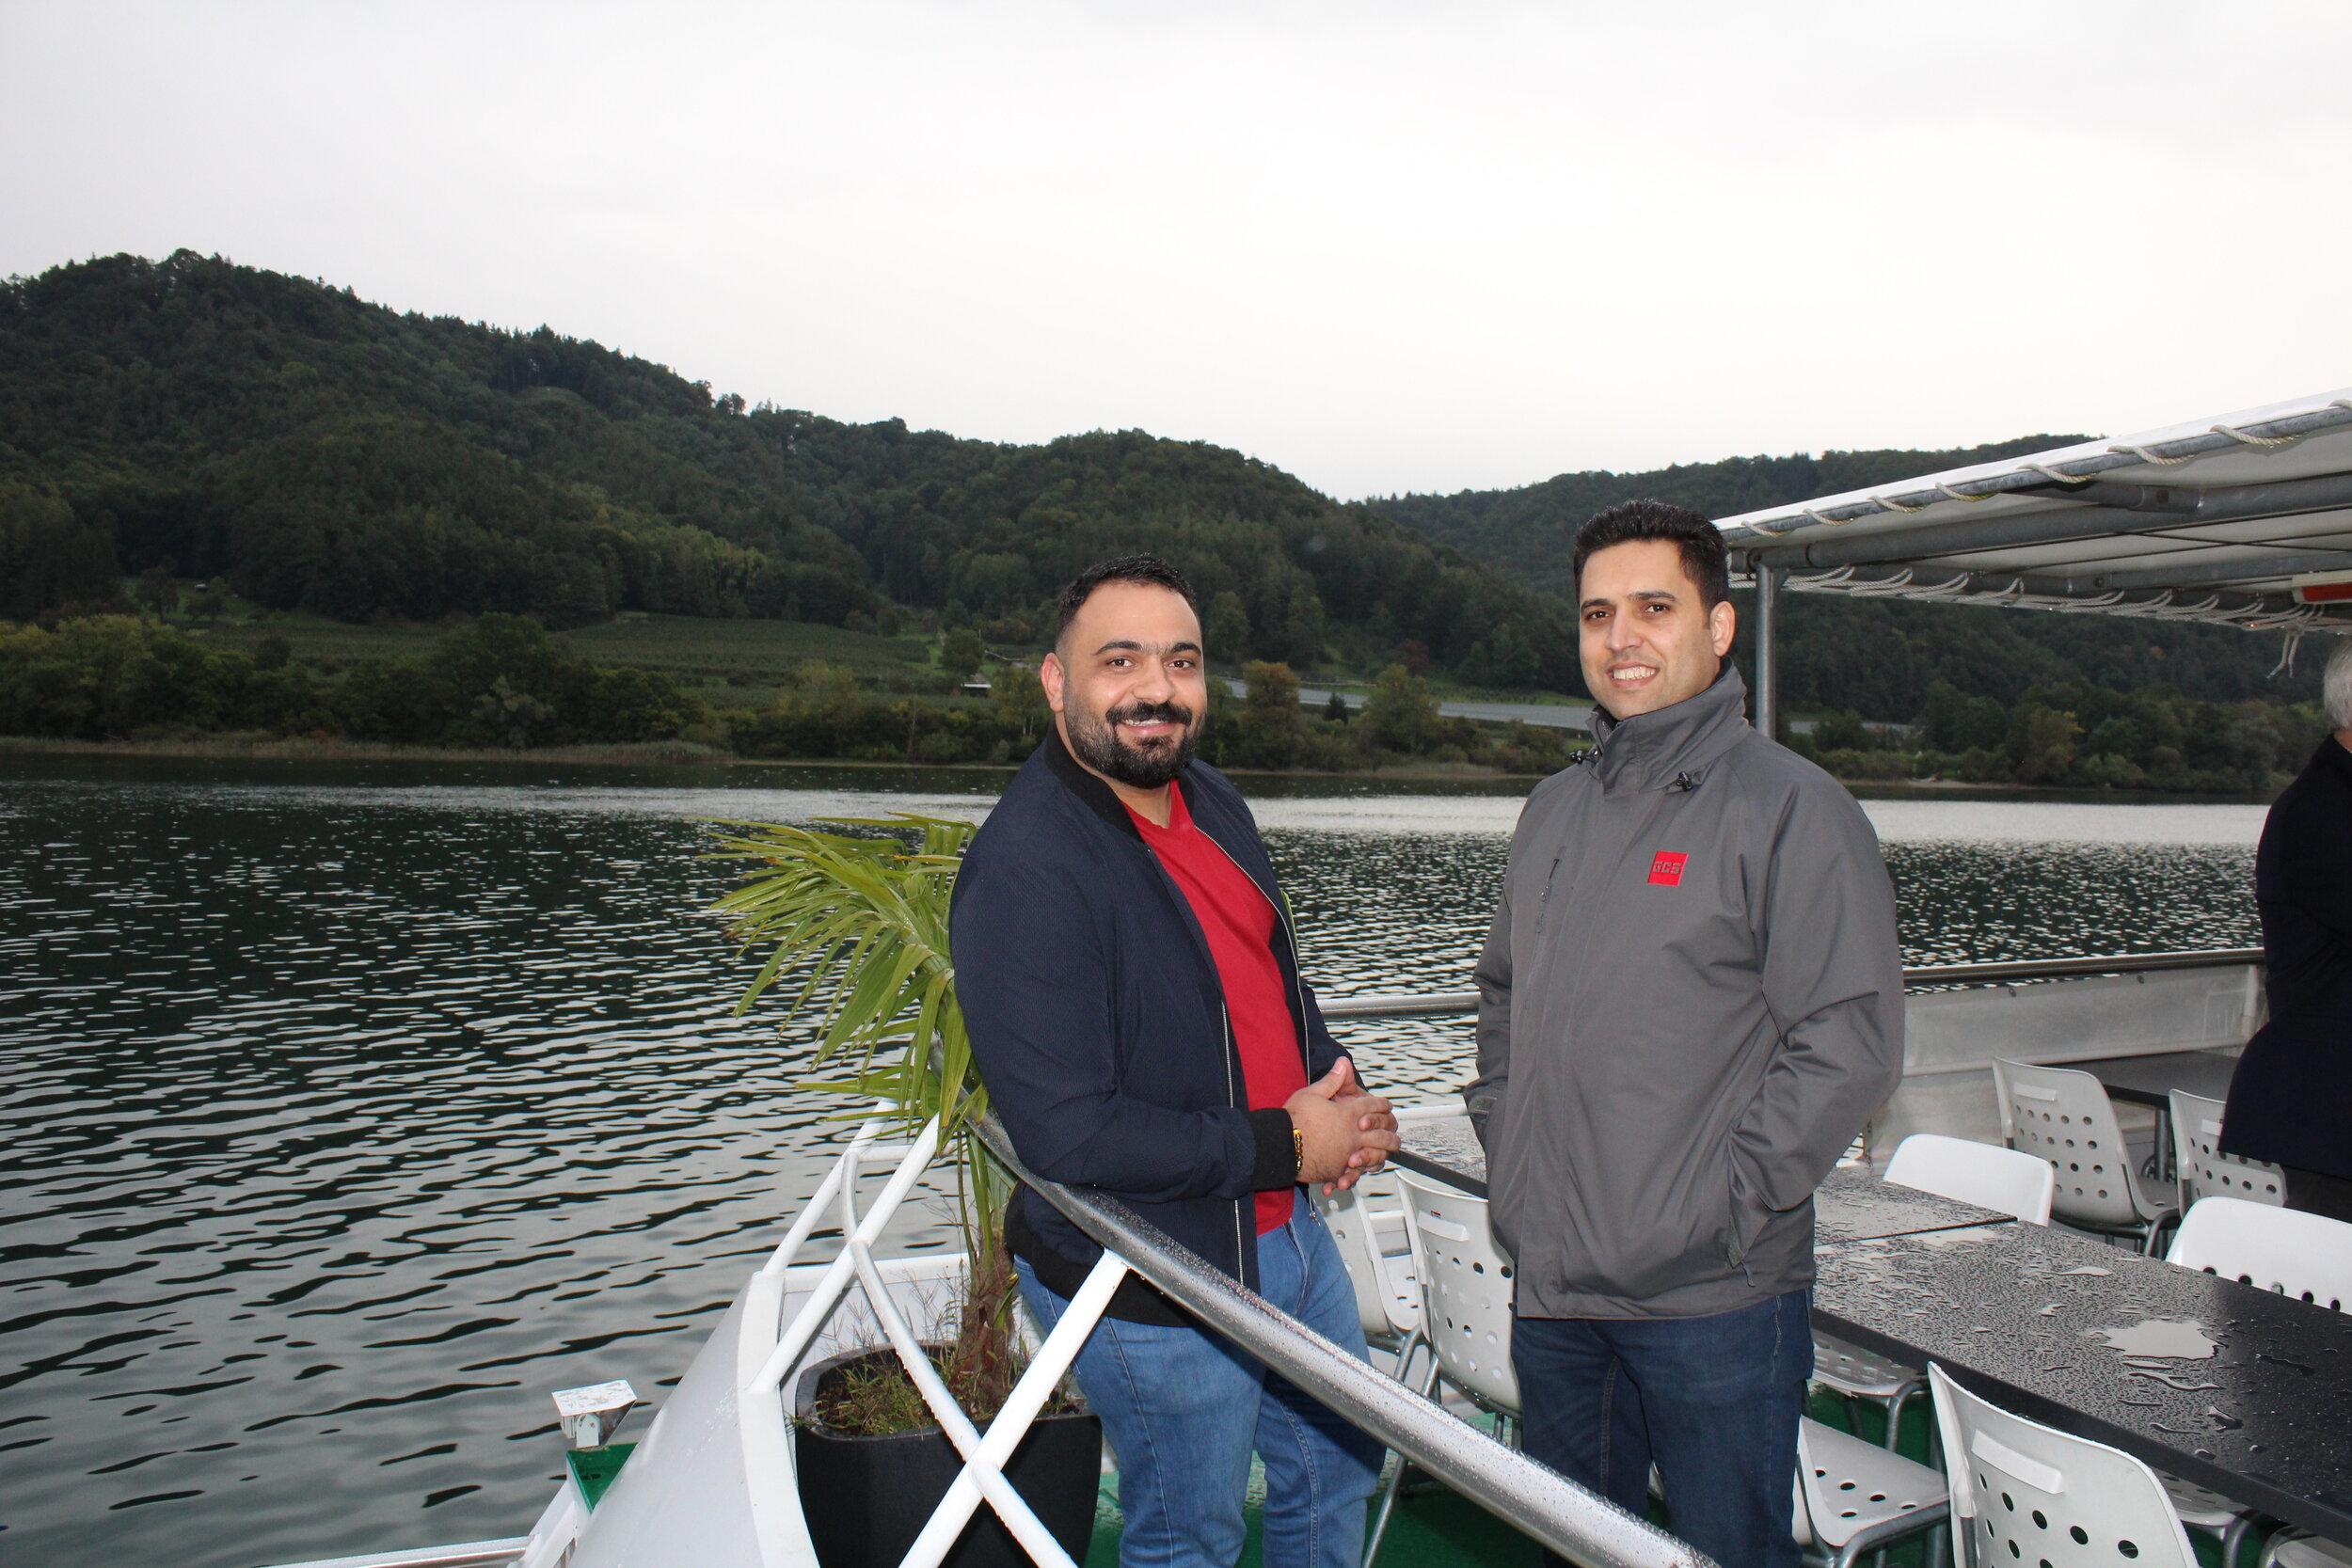 GCS Iraqi Branch Manager Wissam Allamy and Jasim Al Janabi (AKAD International) enjoying the boat trip